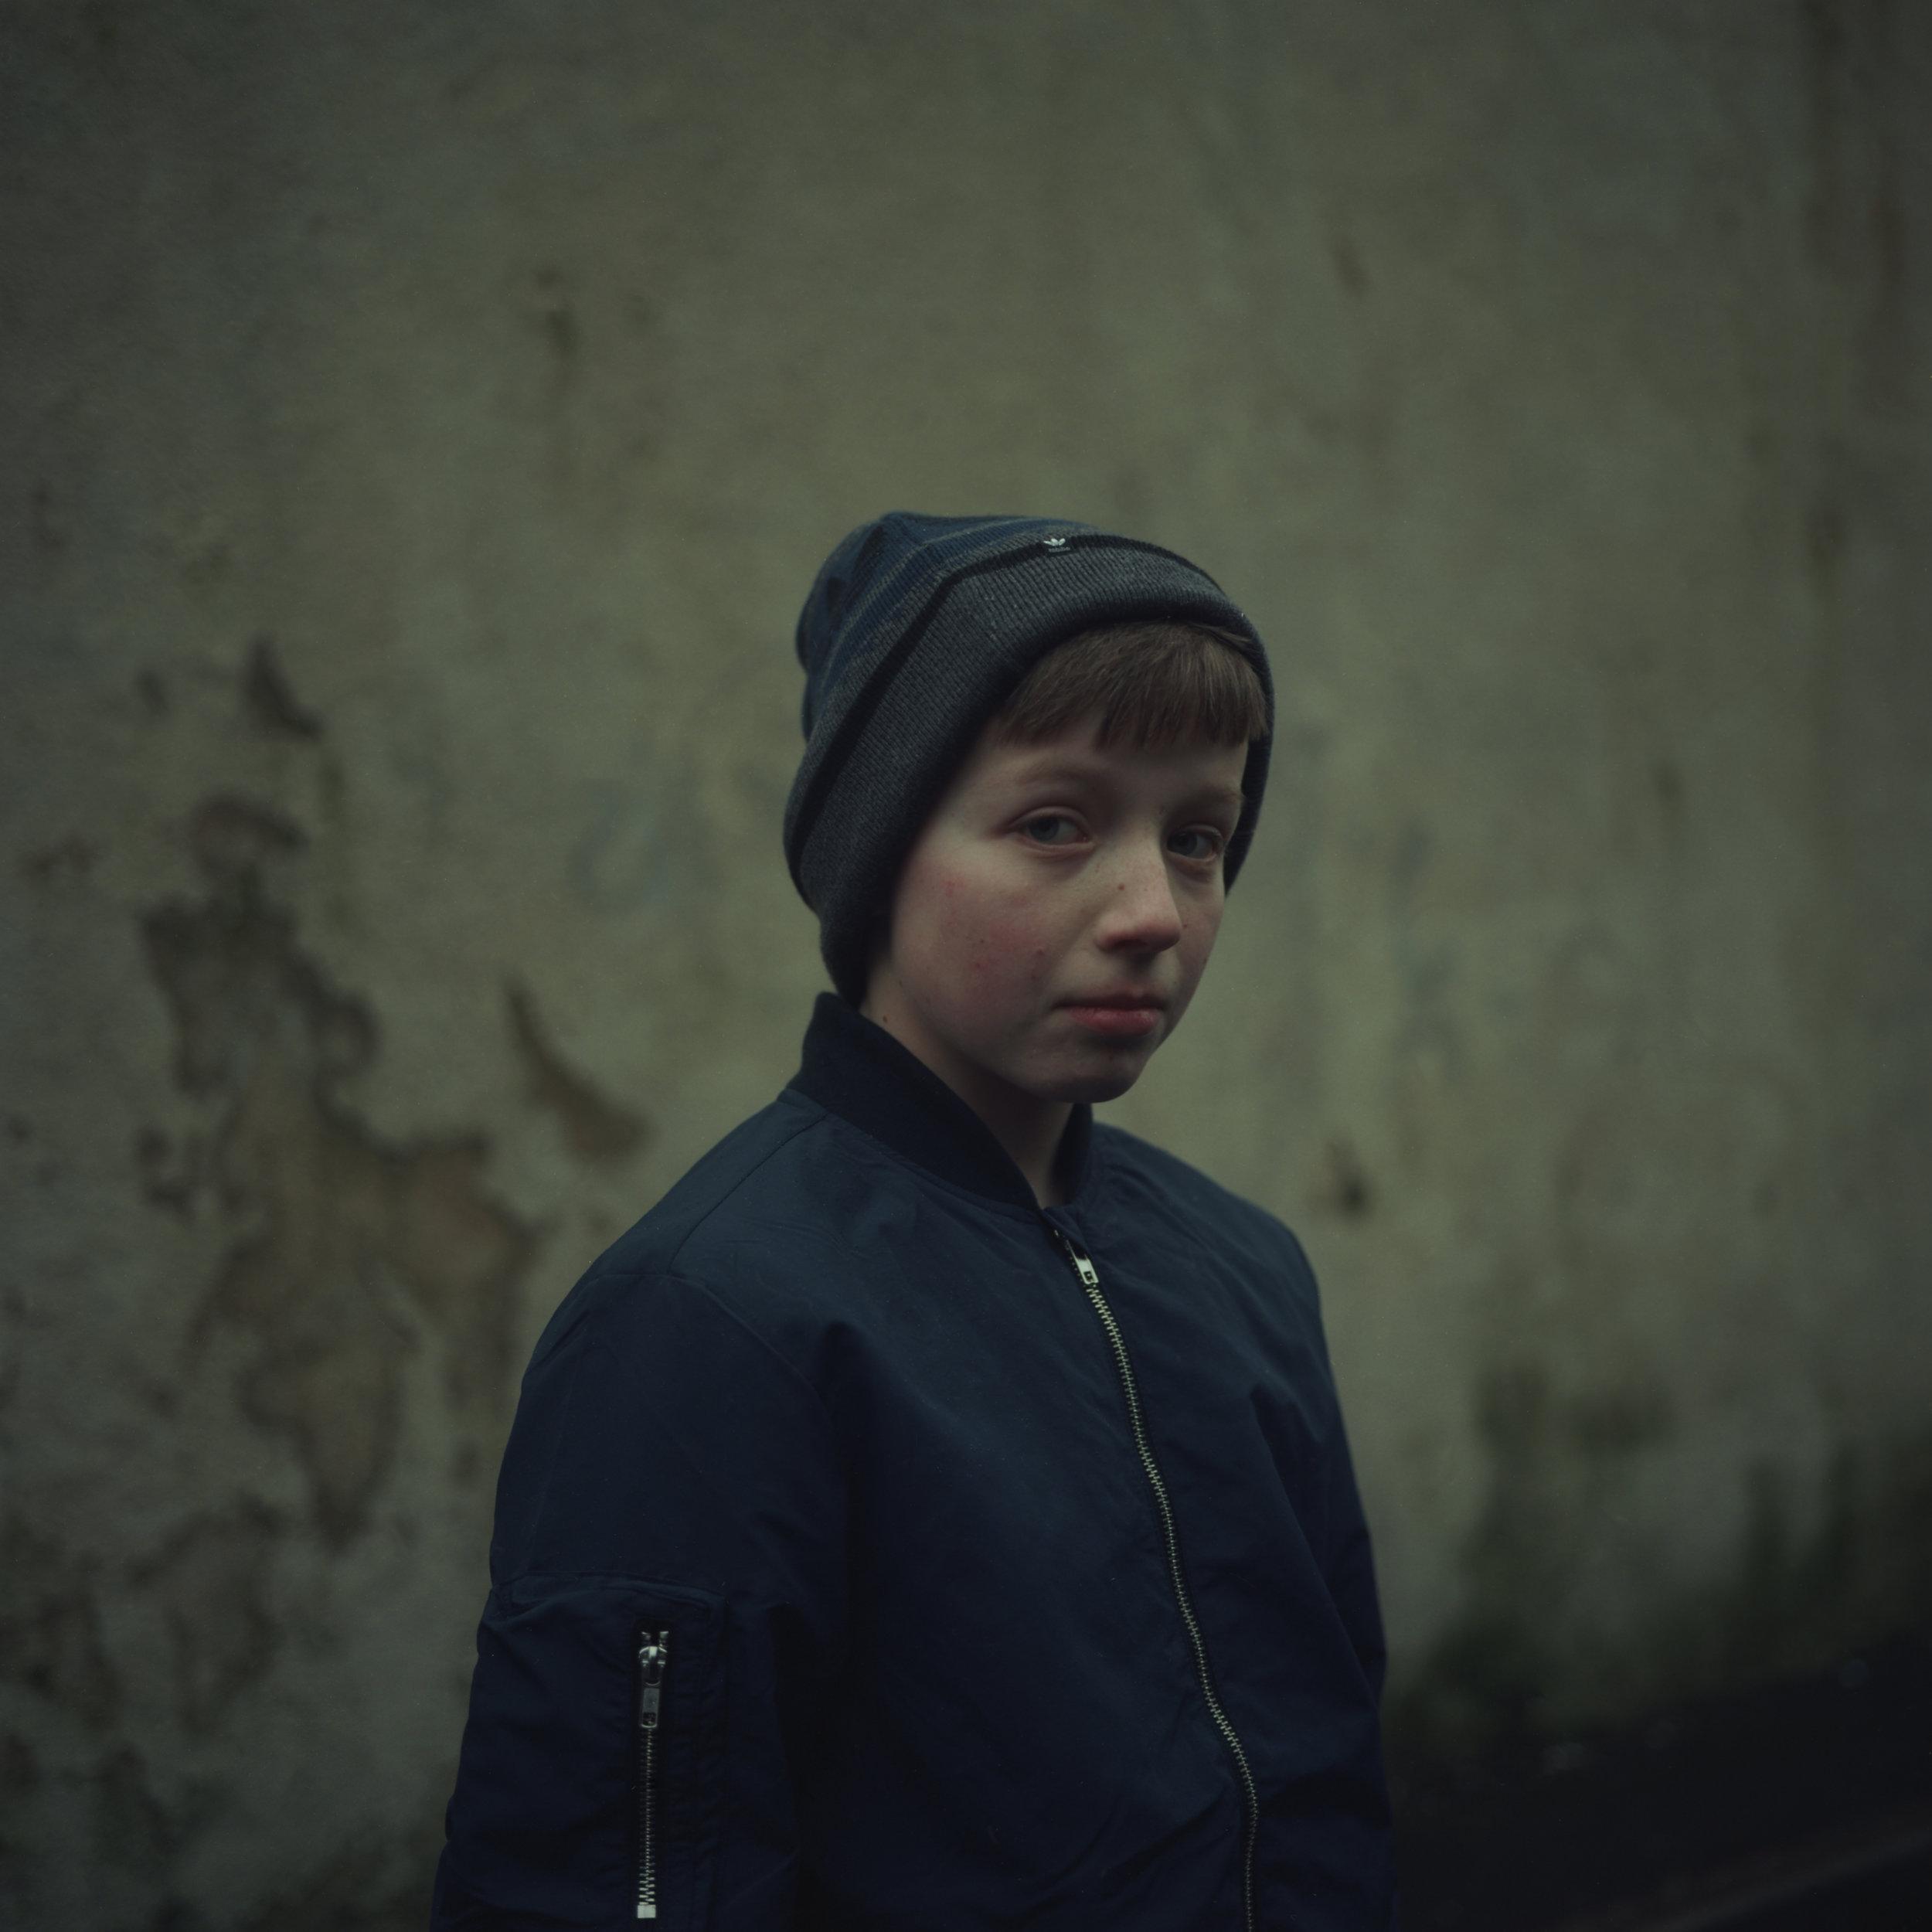 © Clémentine Schneidermann_The Unbearable, the Sadness